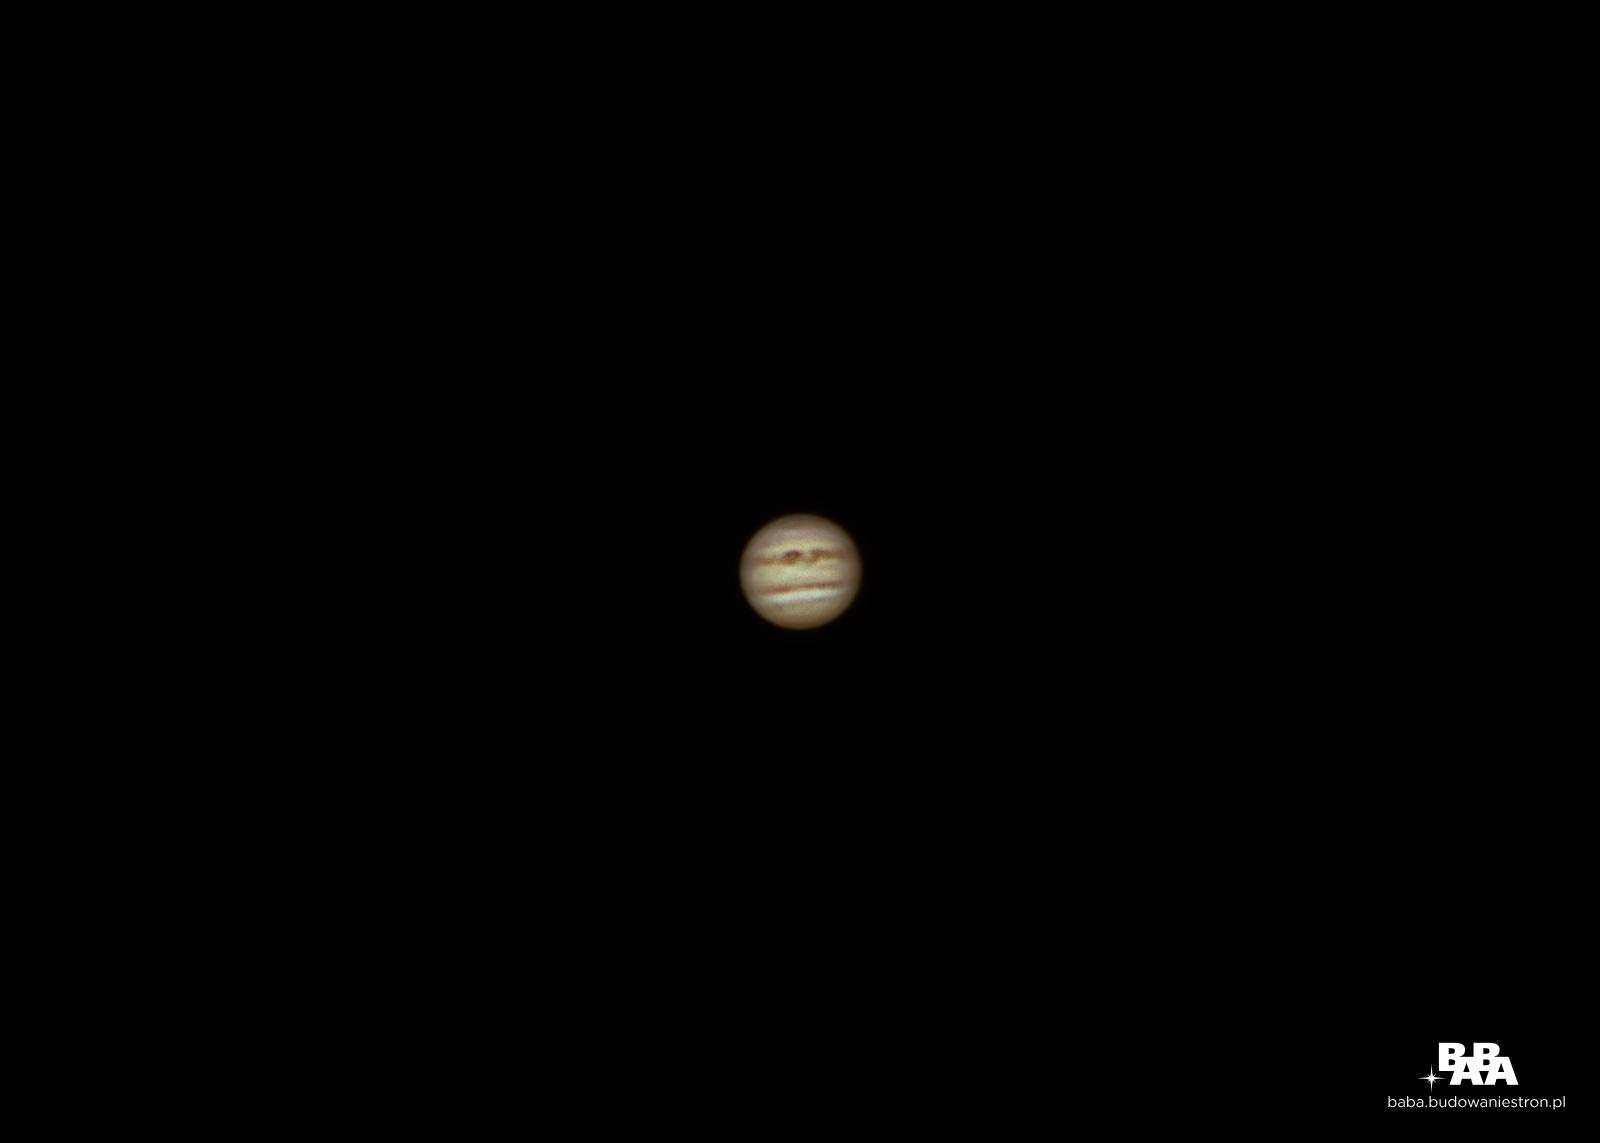 jowisz-2020-06-13-005.jpg.abcfa9fe01a4b09bb5851708bb94469b.jpg